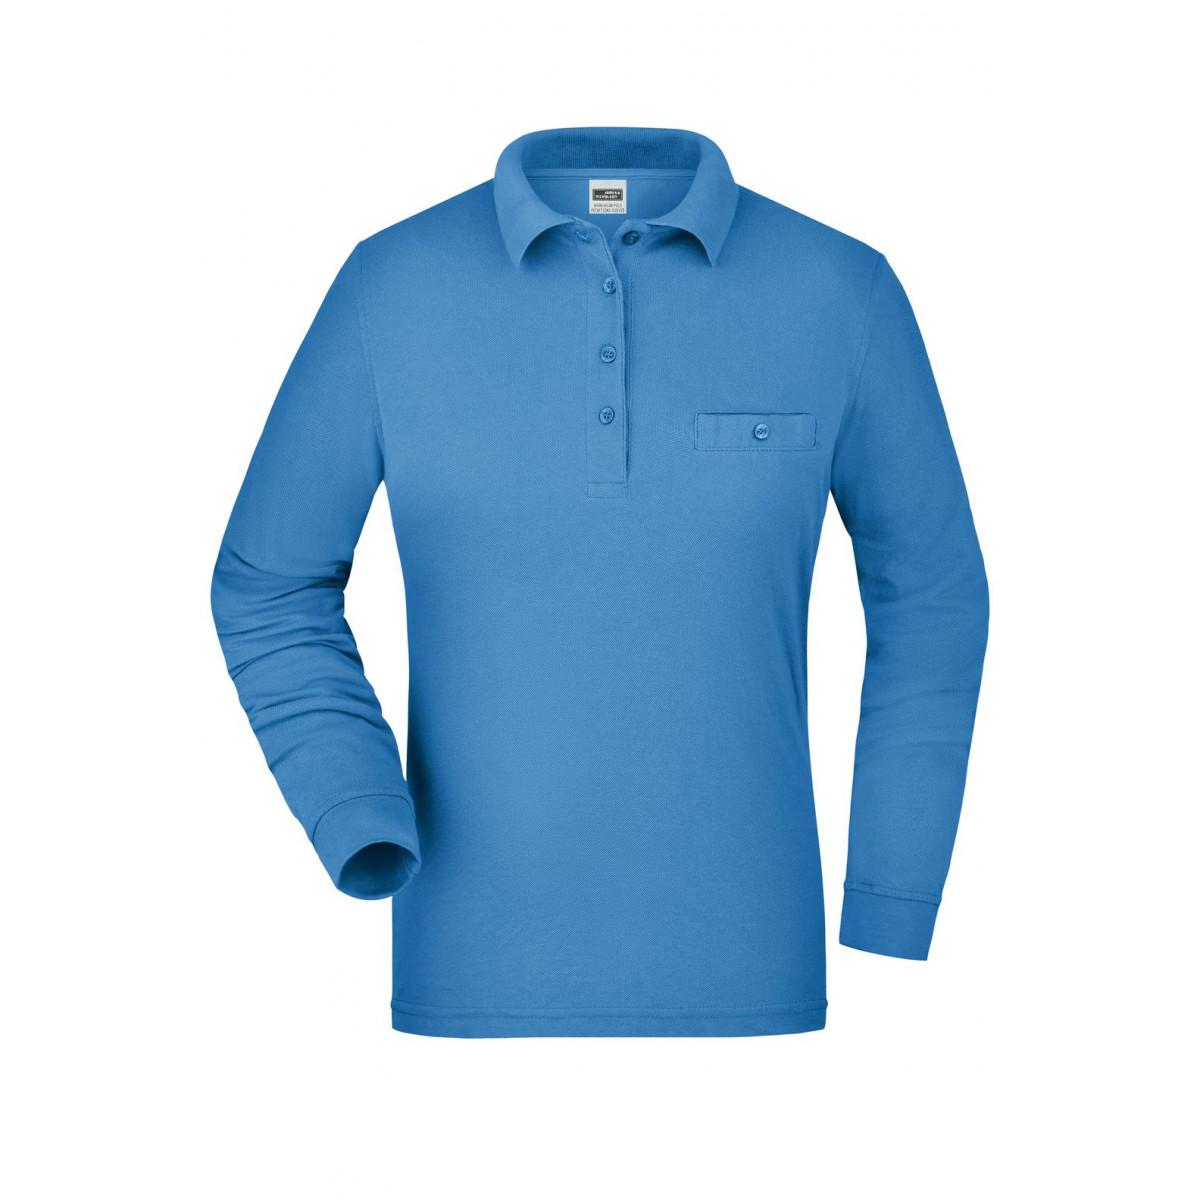 Рубашка поло женская JN865 Ladies Workwear Polo Pocket Longsleeve - Аква